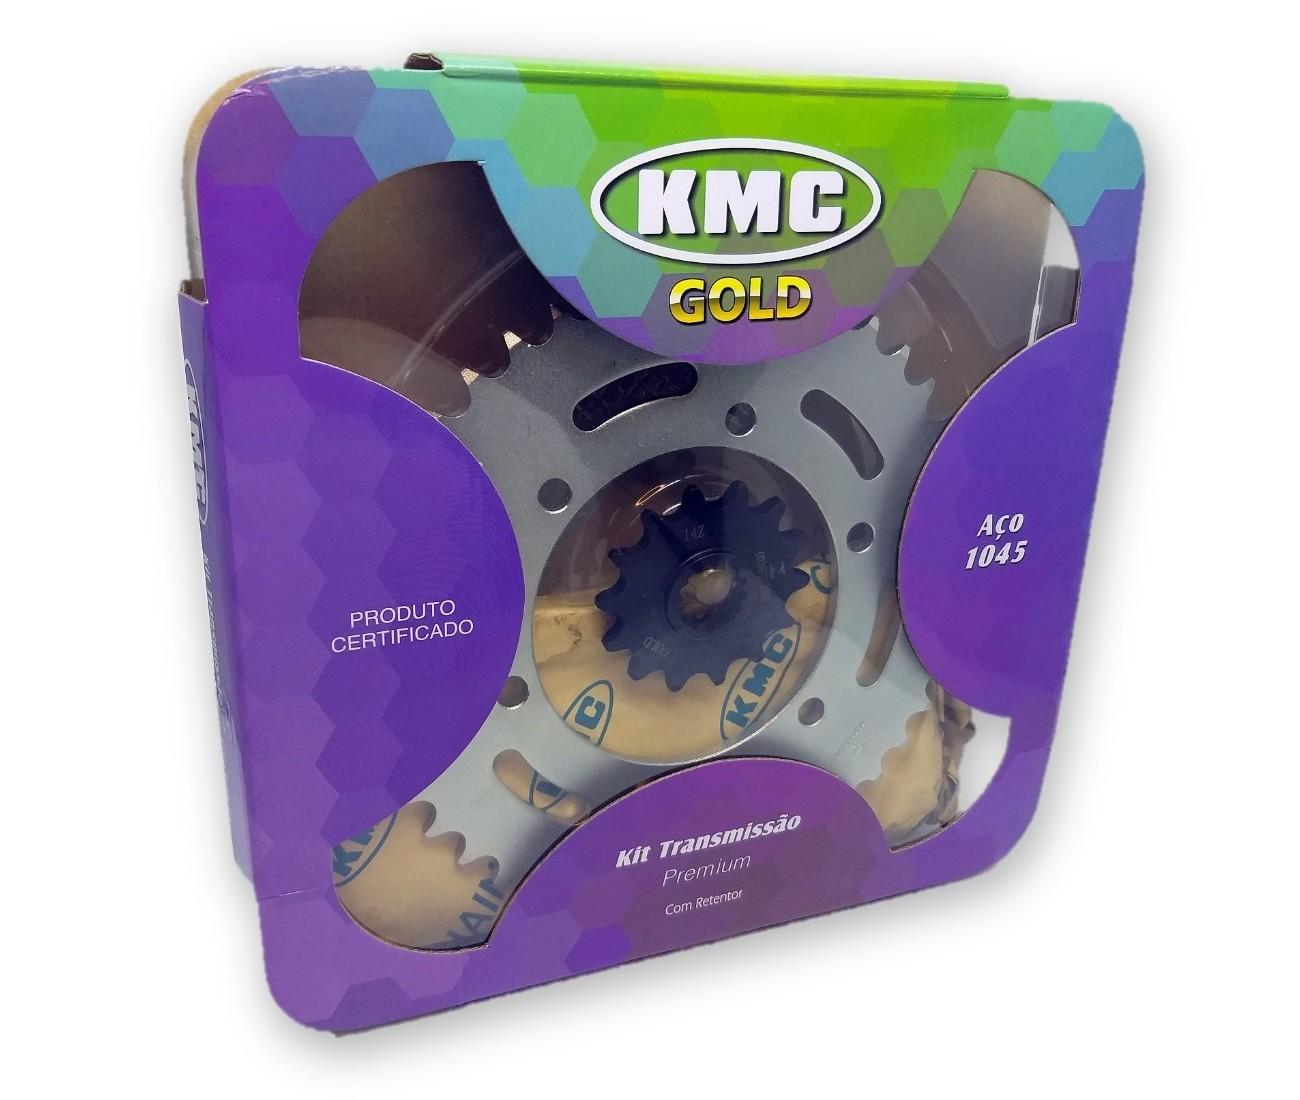 Kit Relação Ninja 250-300 Com Retentor Aço 1045 KMC GOLD 520x106x43x17